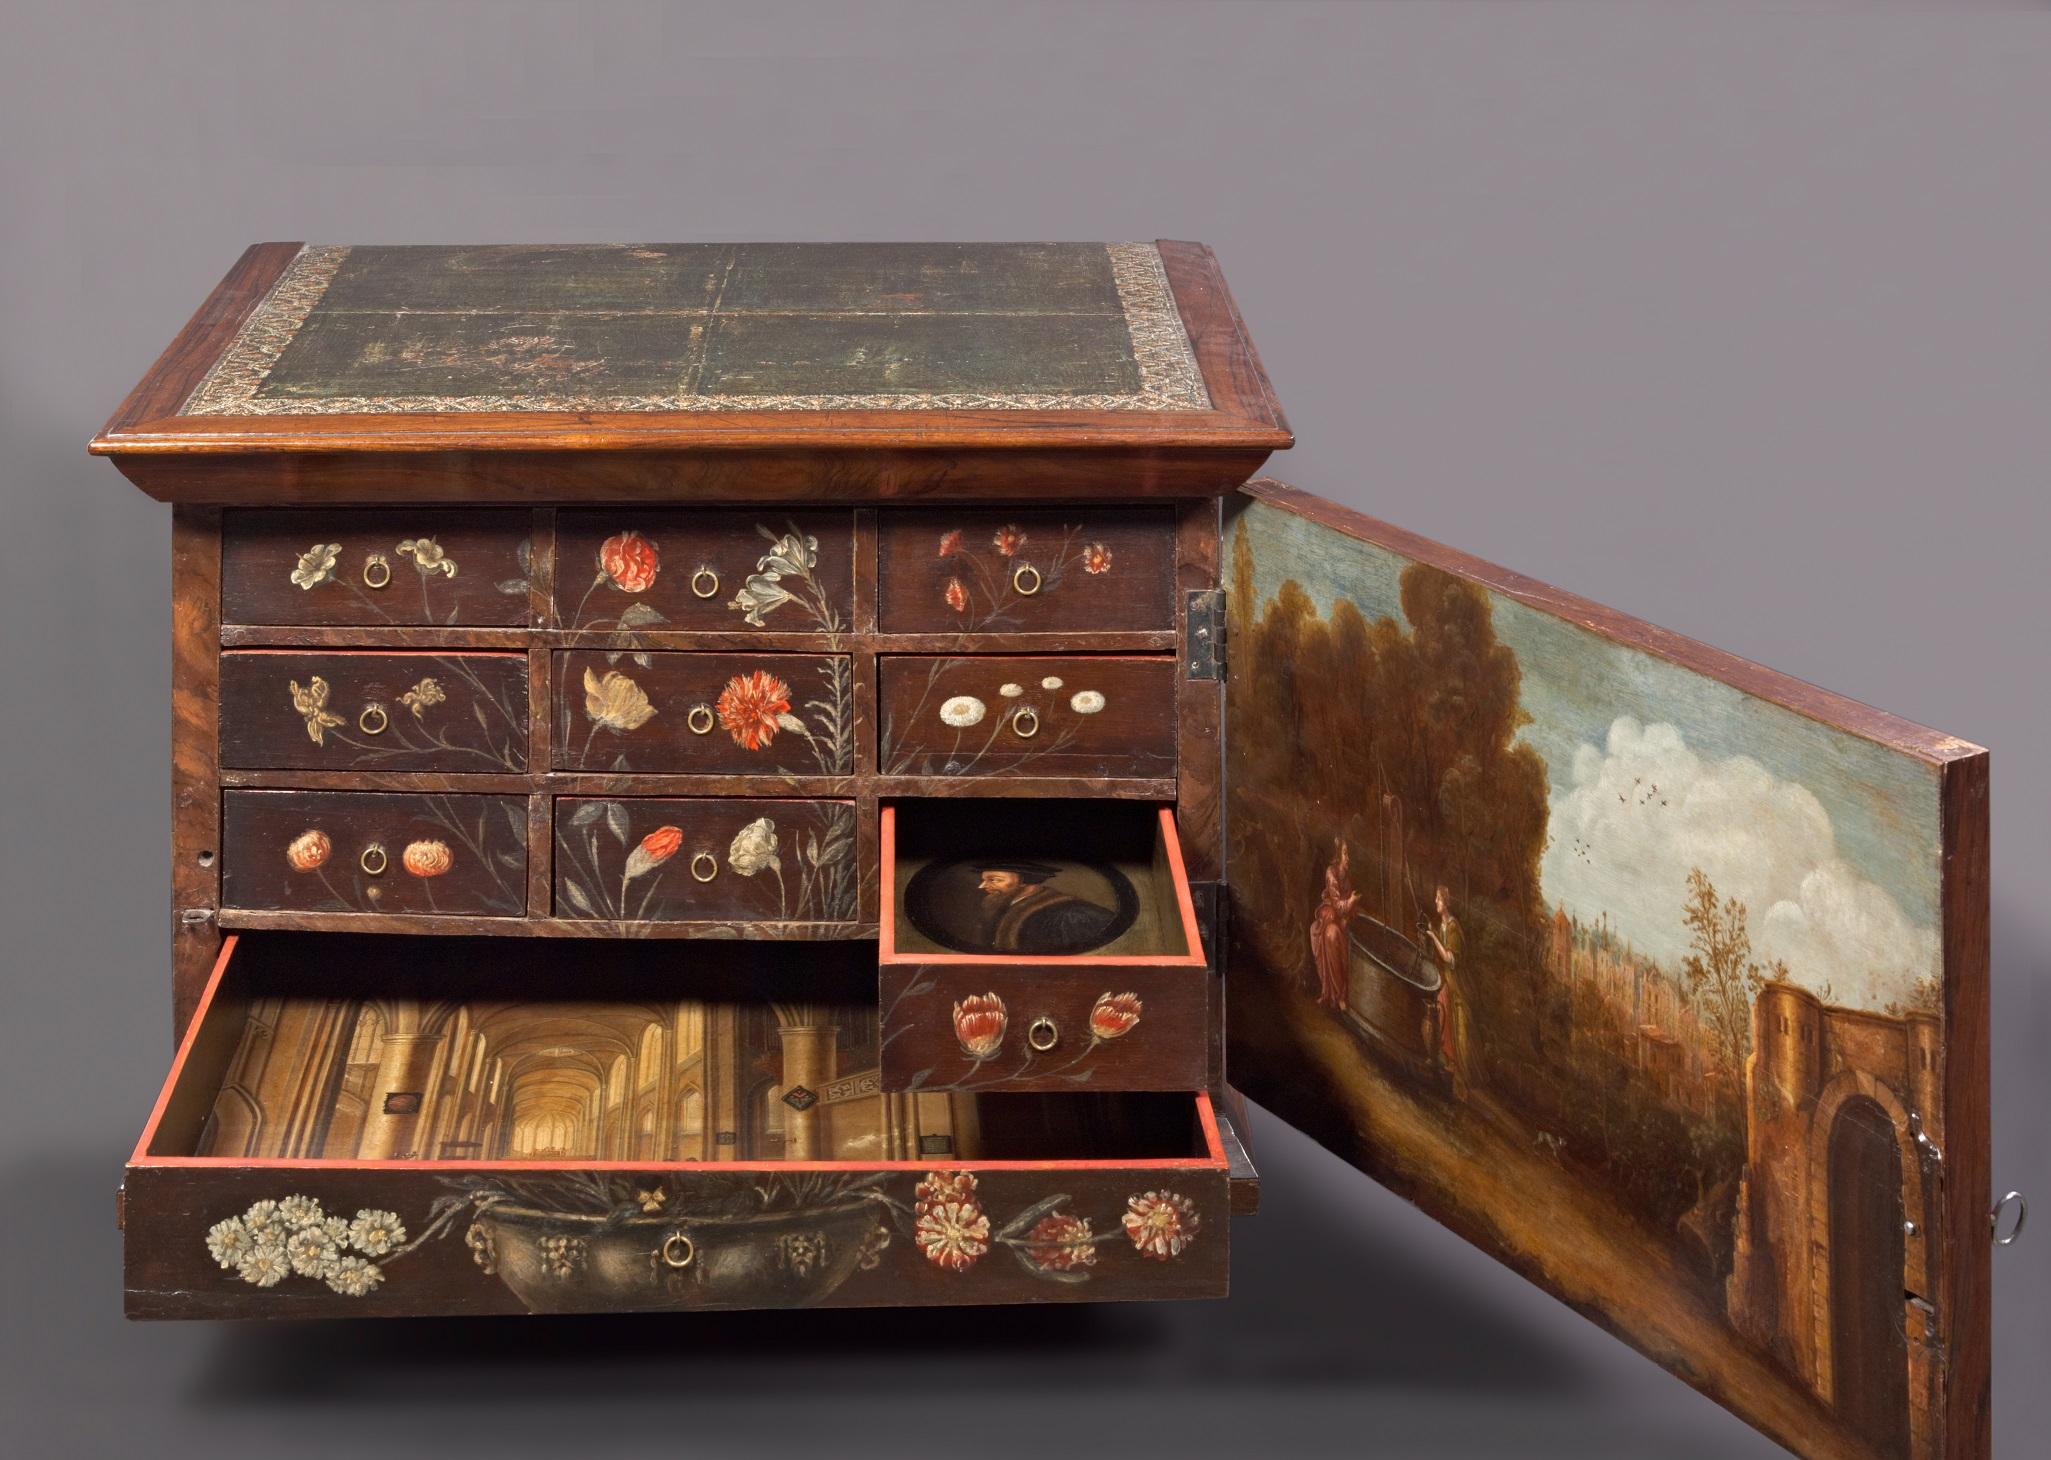 Fig. 9. Susanna van Steenwijck (painter), Nijenburg Lutheran Cabinet, ca. 1665On loan from the heirs of E. Snethlage-van Foreest